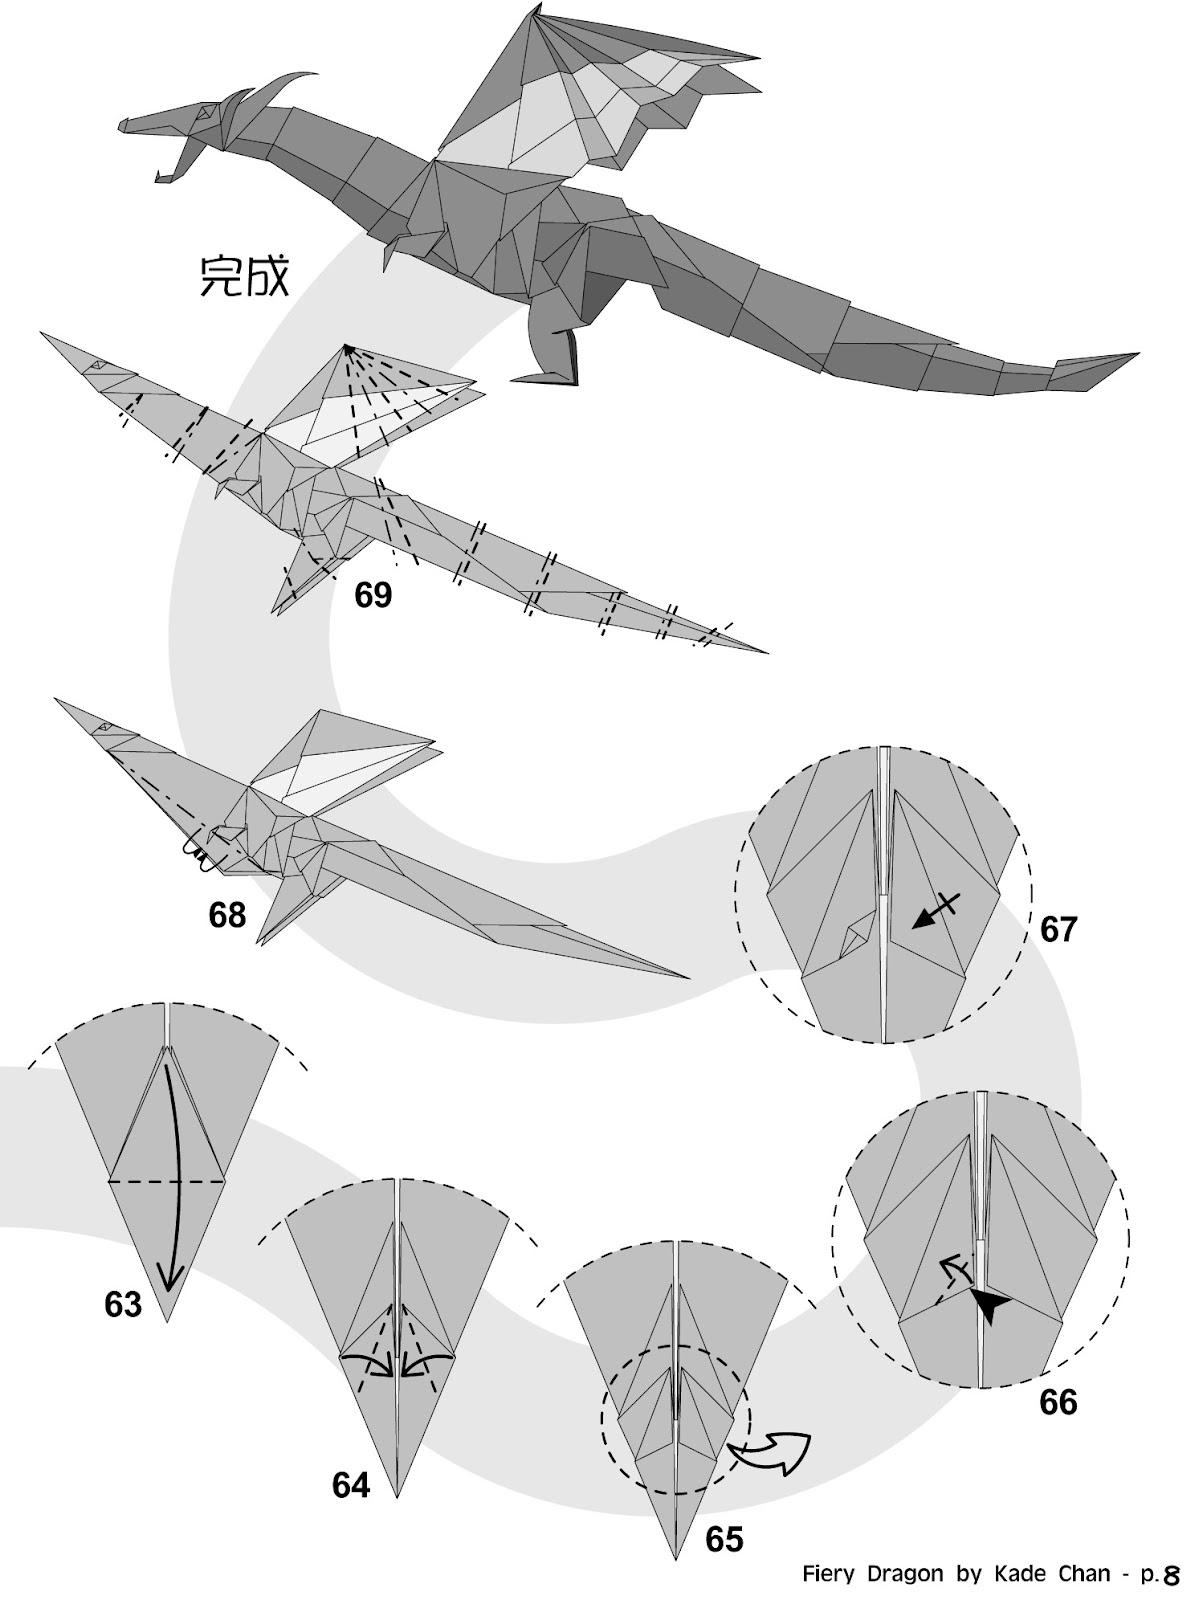 origami angel step by diagram single phase 4 pole motor wiring kade chan blog 香港摺紙工作室 日誌 fiery dragon